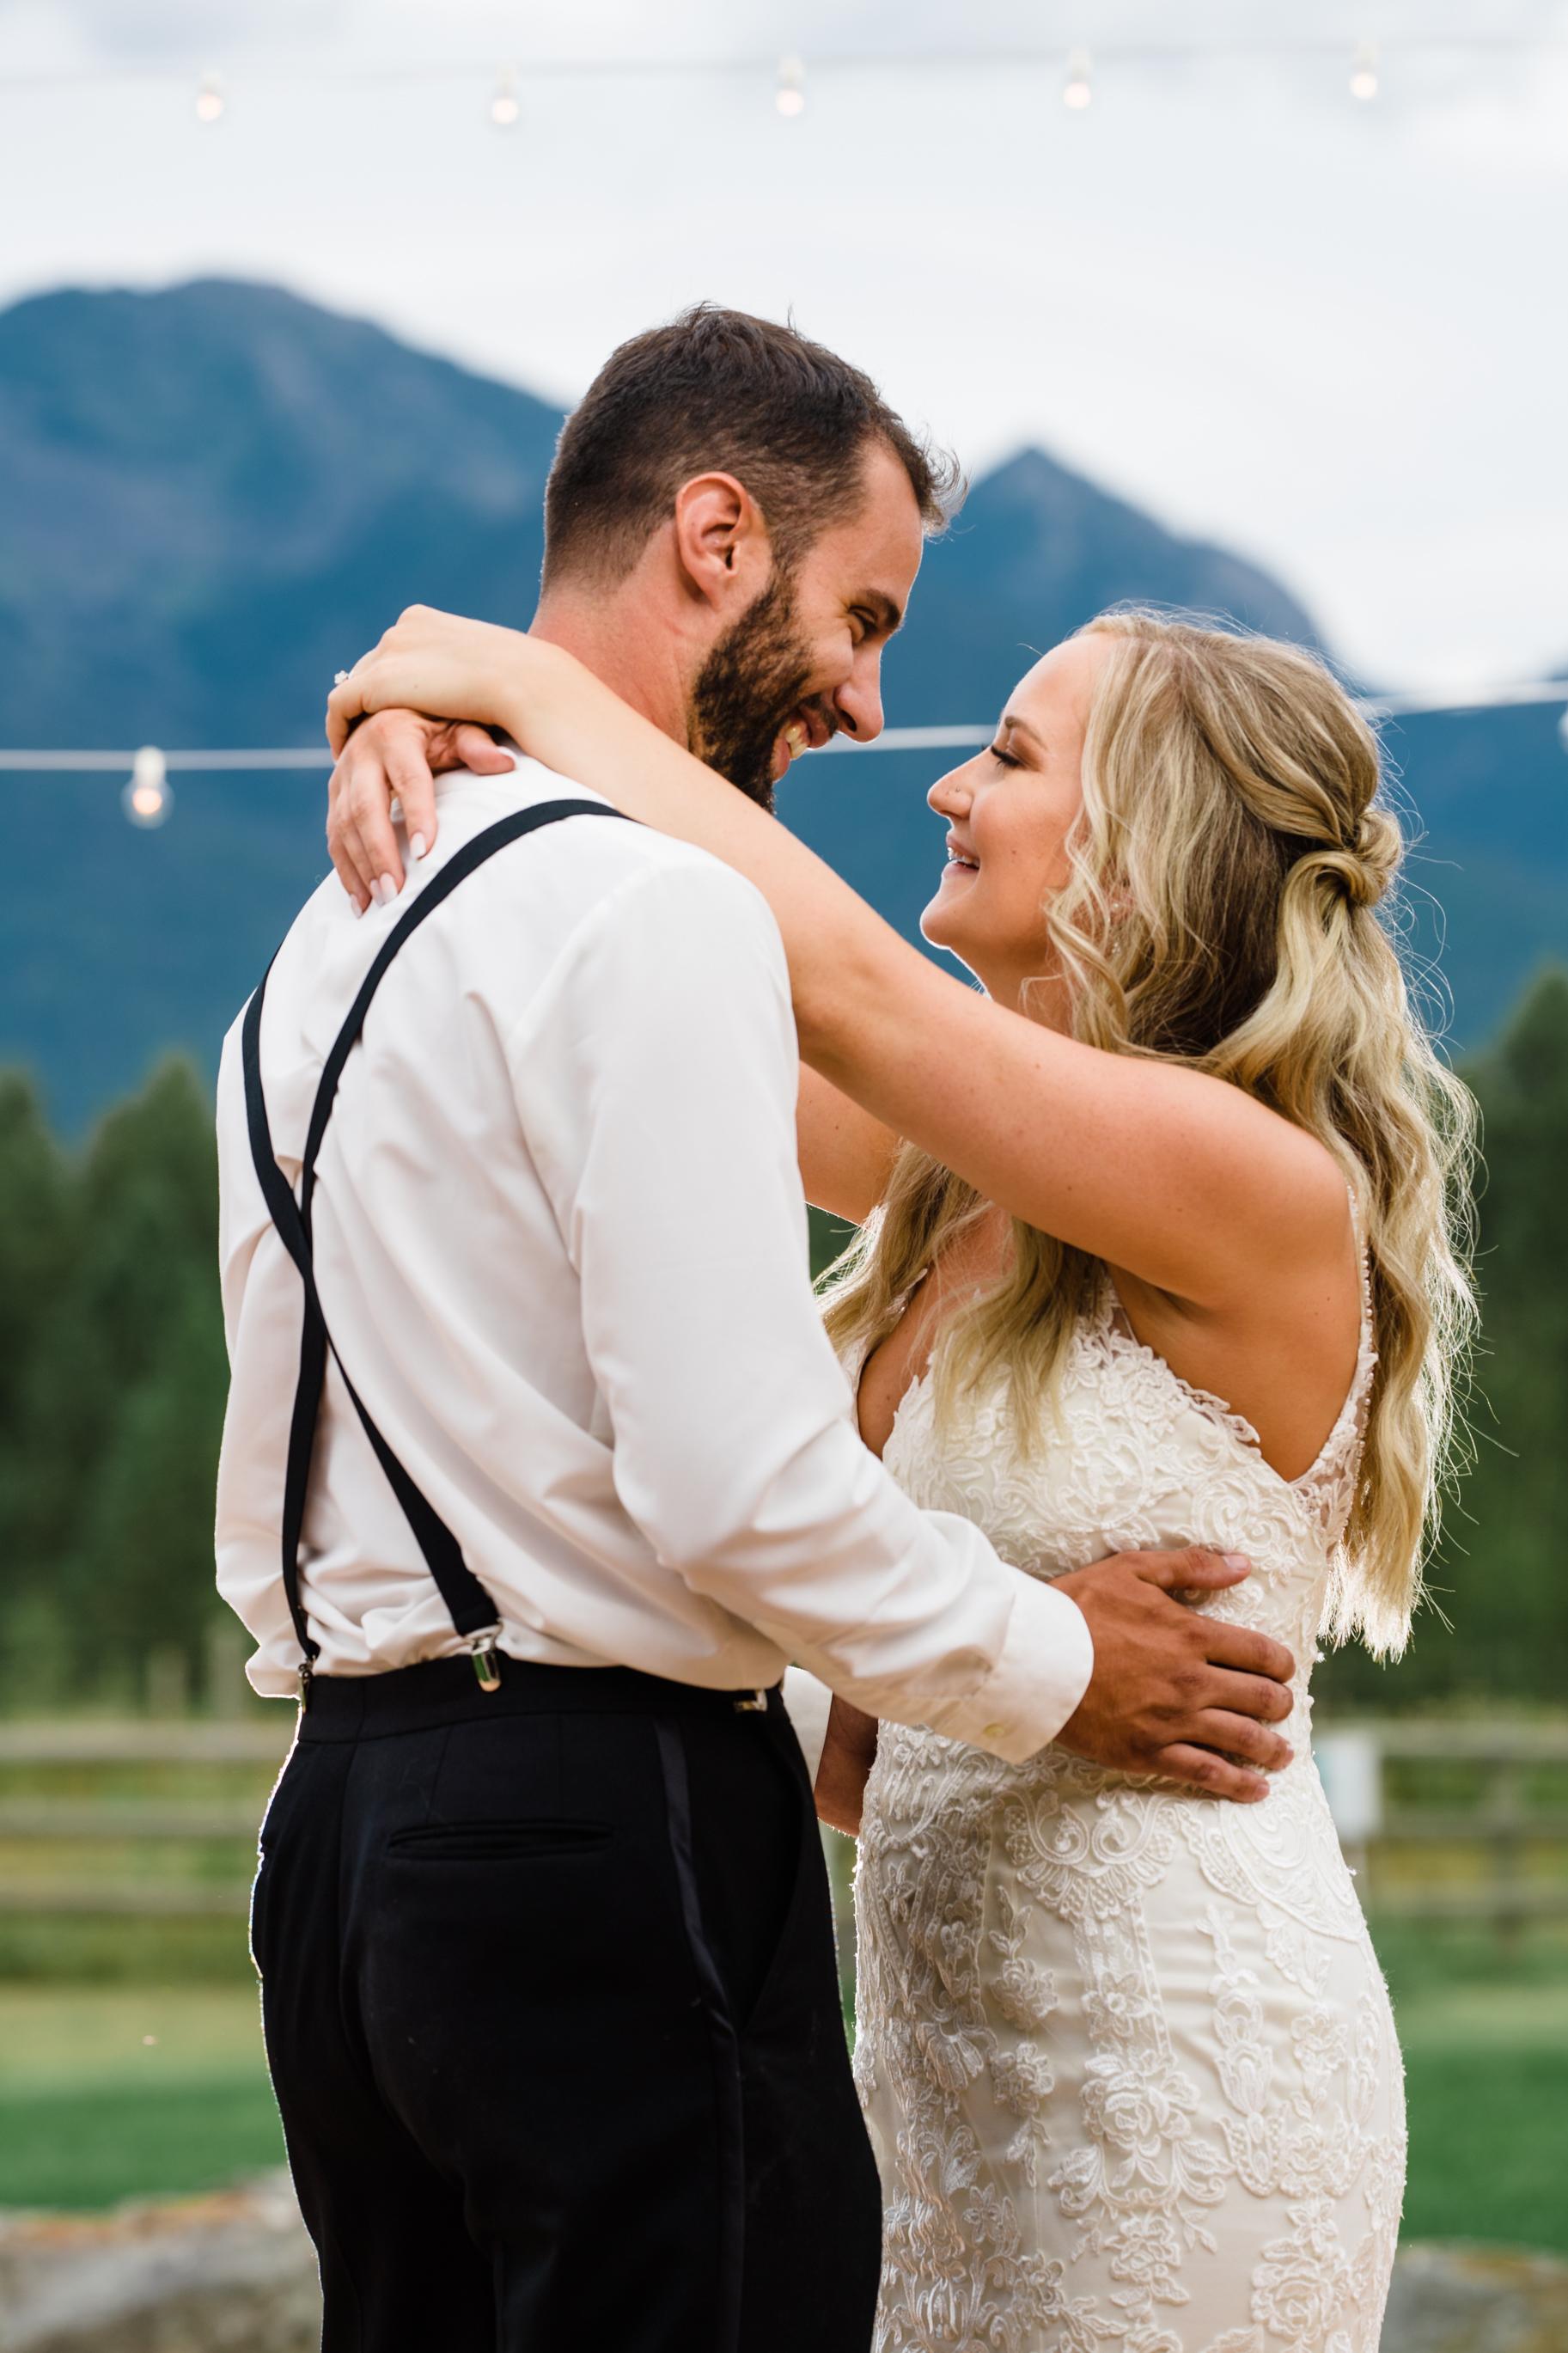 048Sky Ridge Ranch Wedding_Montana Wedding Photographer_Jessica & Brian_Honeybee Weddings_August 24, 2019-29.jpg